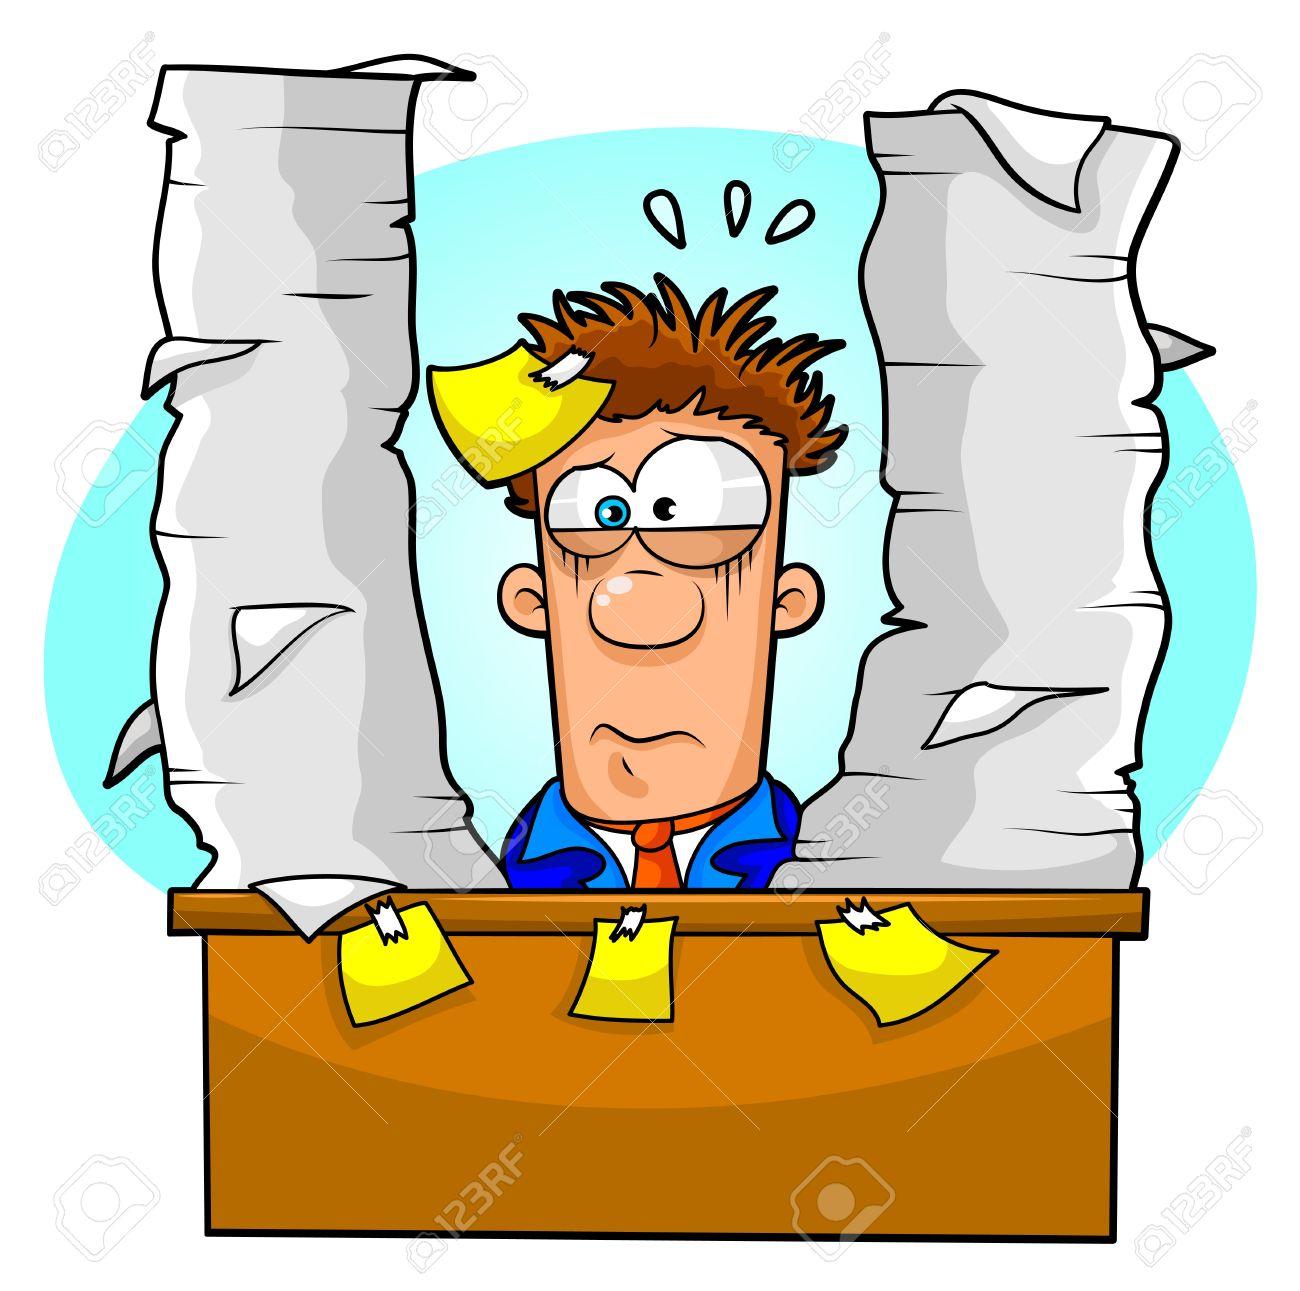 Overwhelmed Office Worker Clipart.